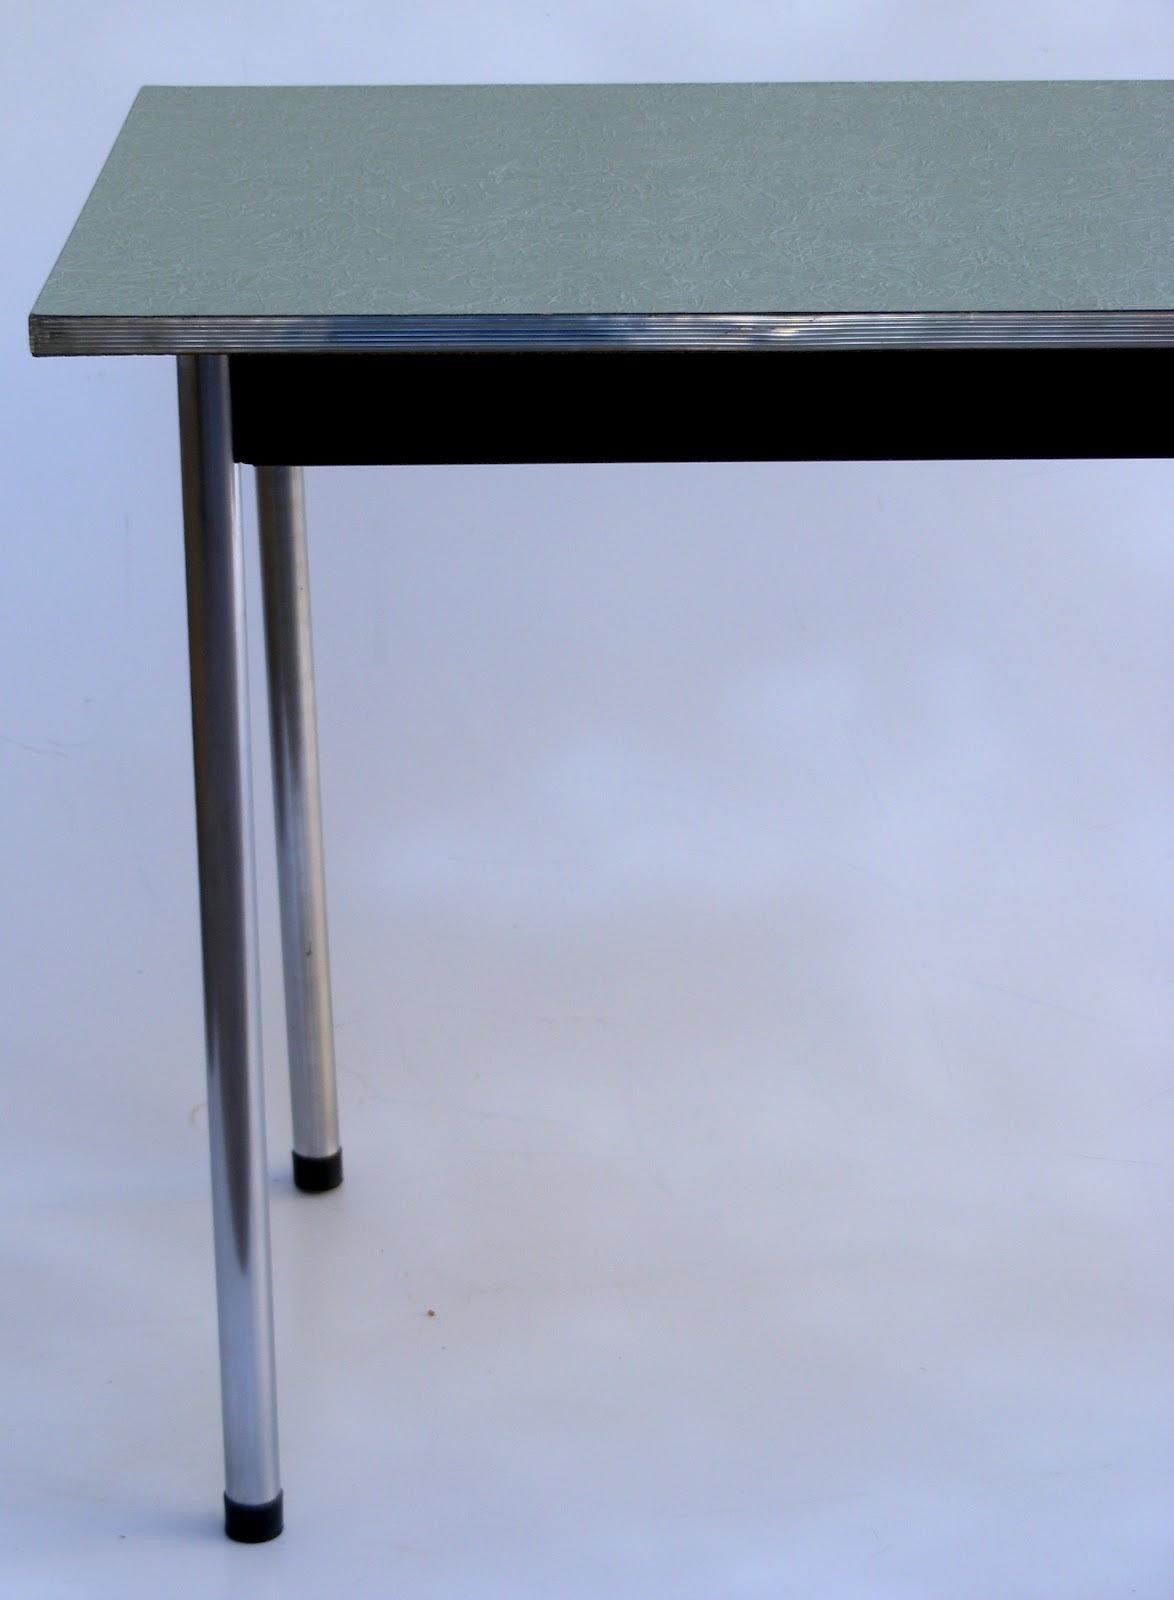 Vamp furniture new furniture stock at vamp 29 june 2012 - Formica top kitchen table ...